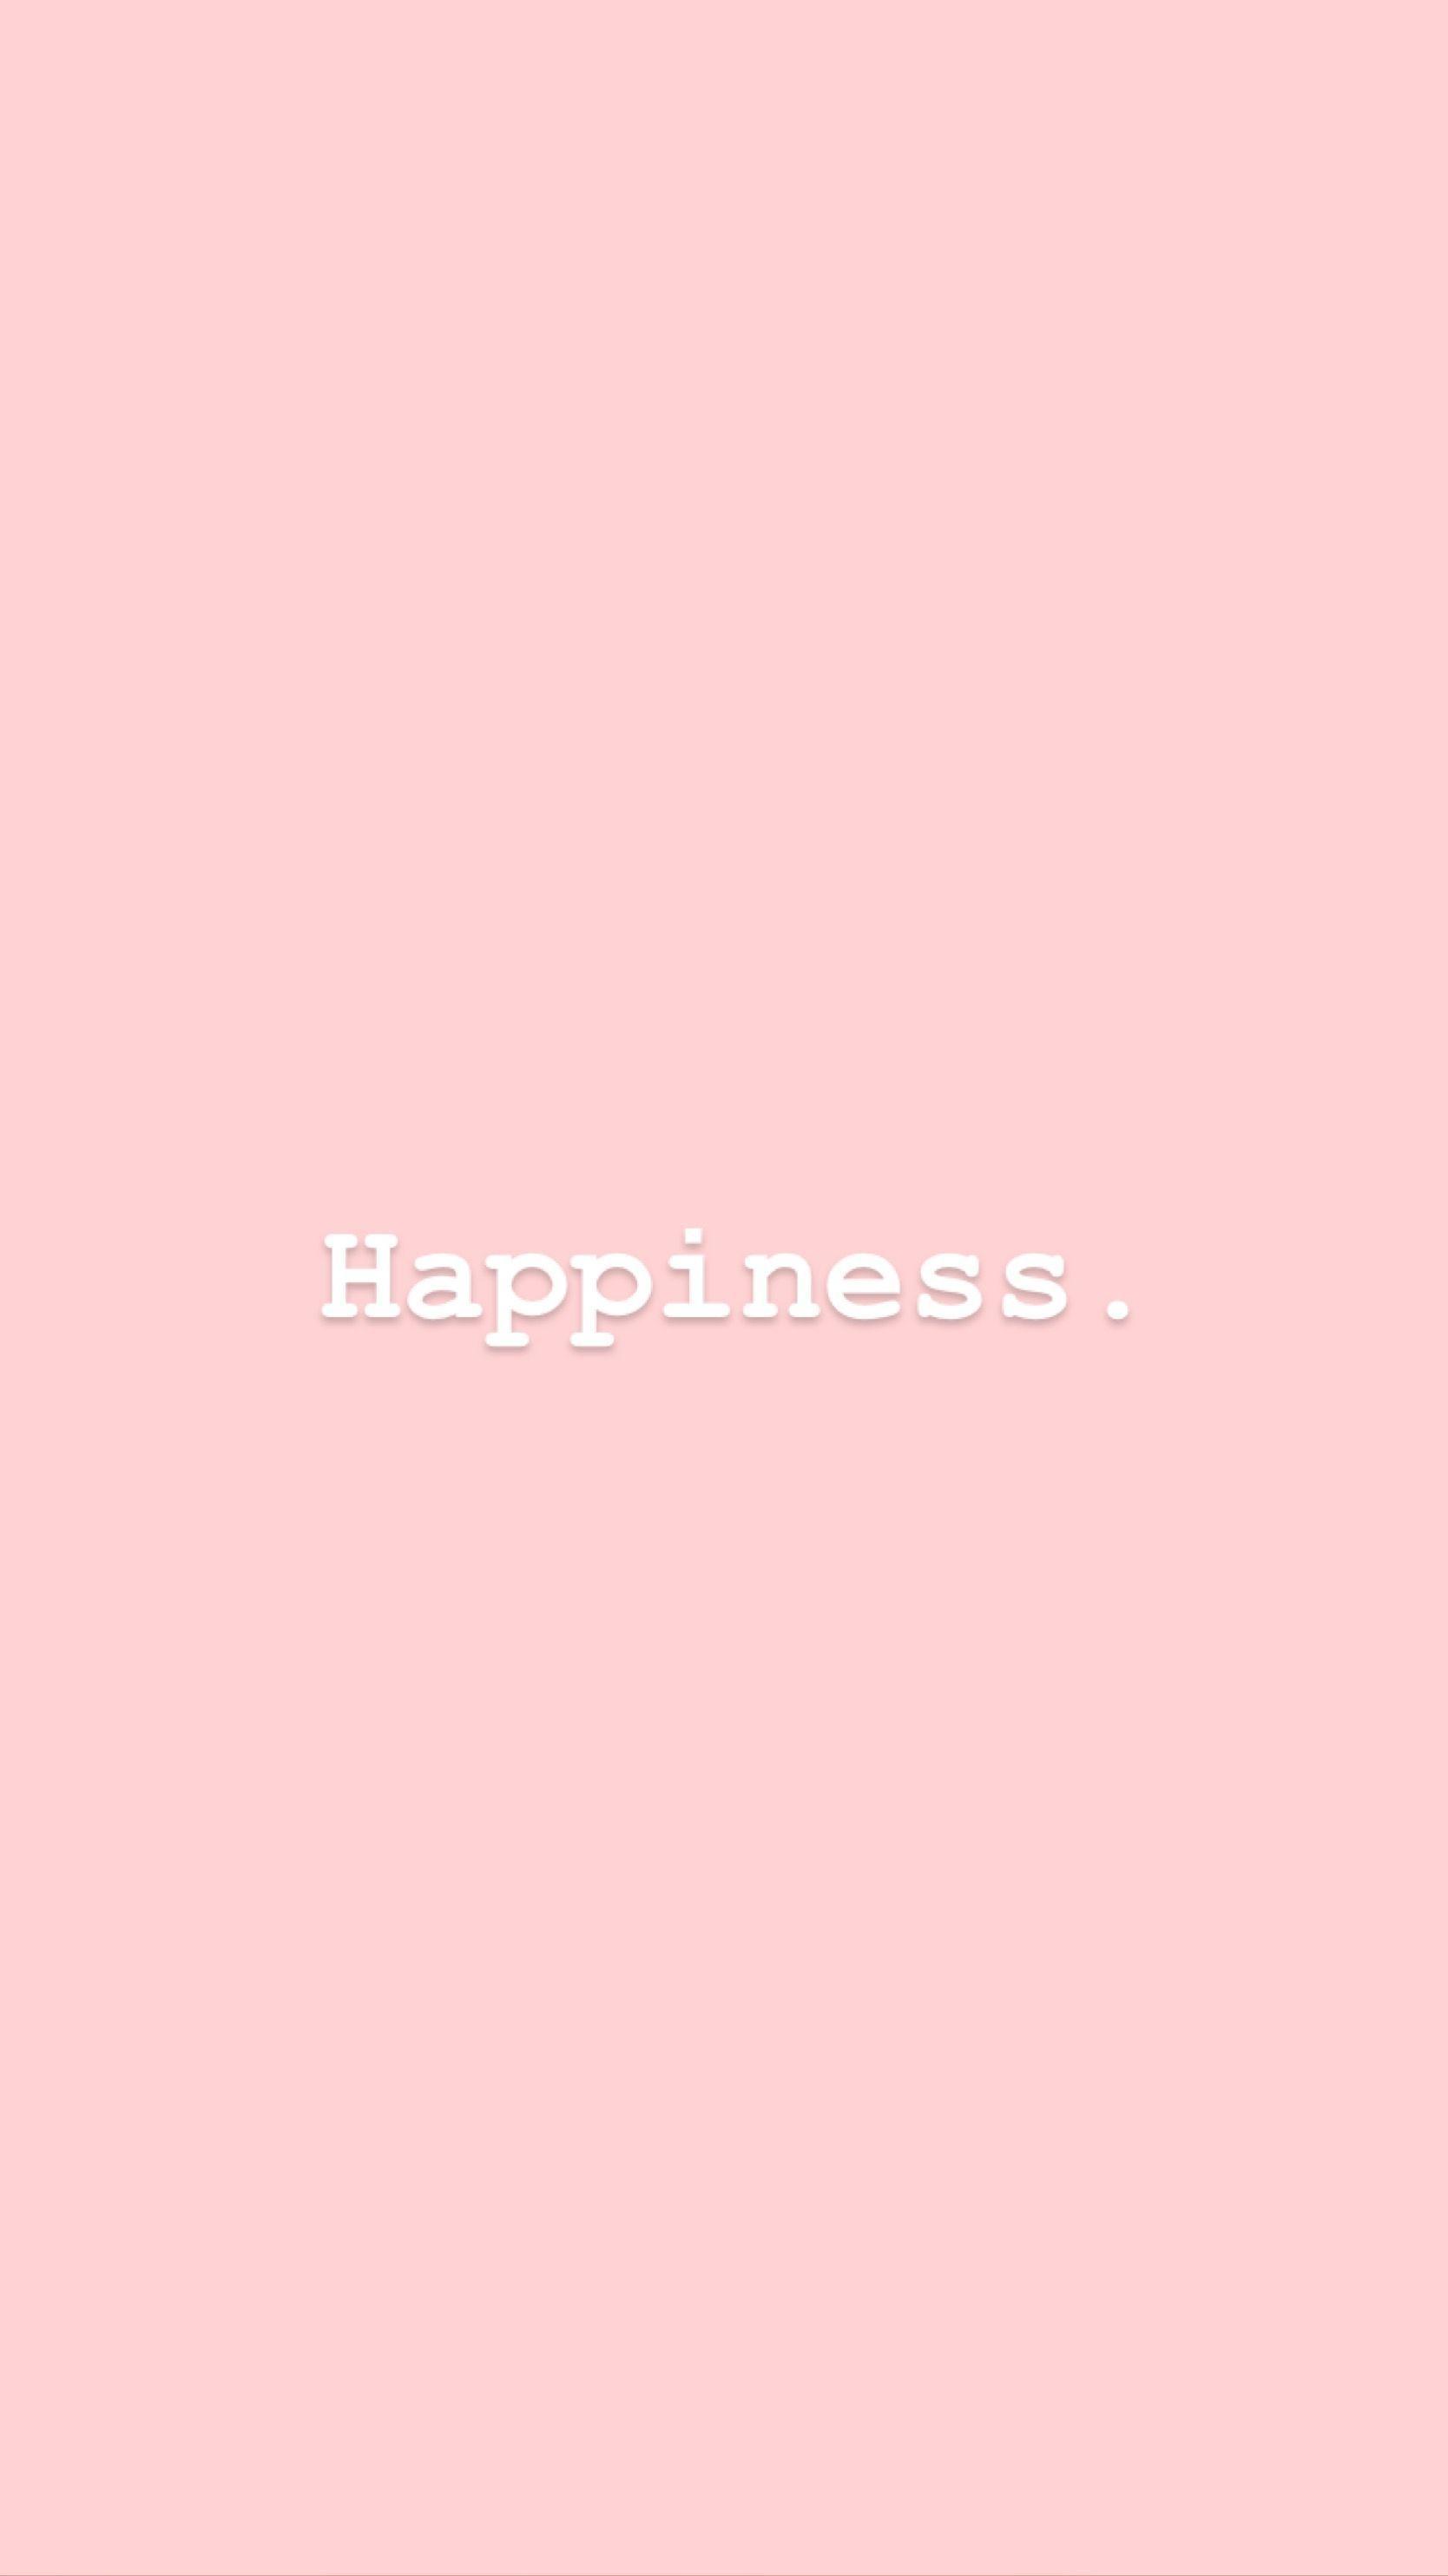 Pastel Pink Tumblr Iphone Wallpapers Top Free Pastel Pink Tumblr Iphone Backgrounds Wallpaperaccess